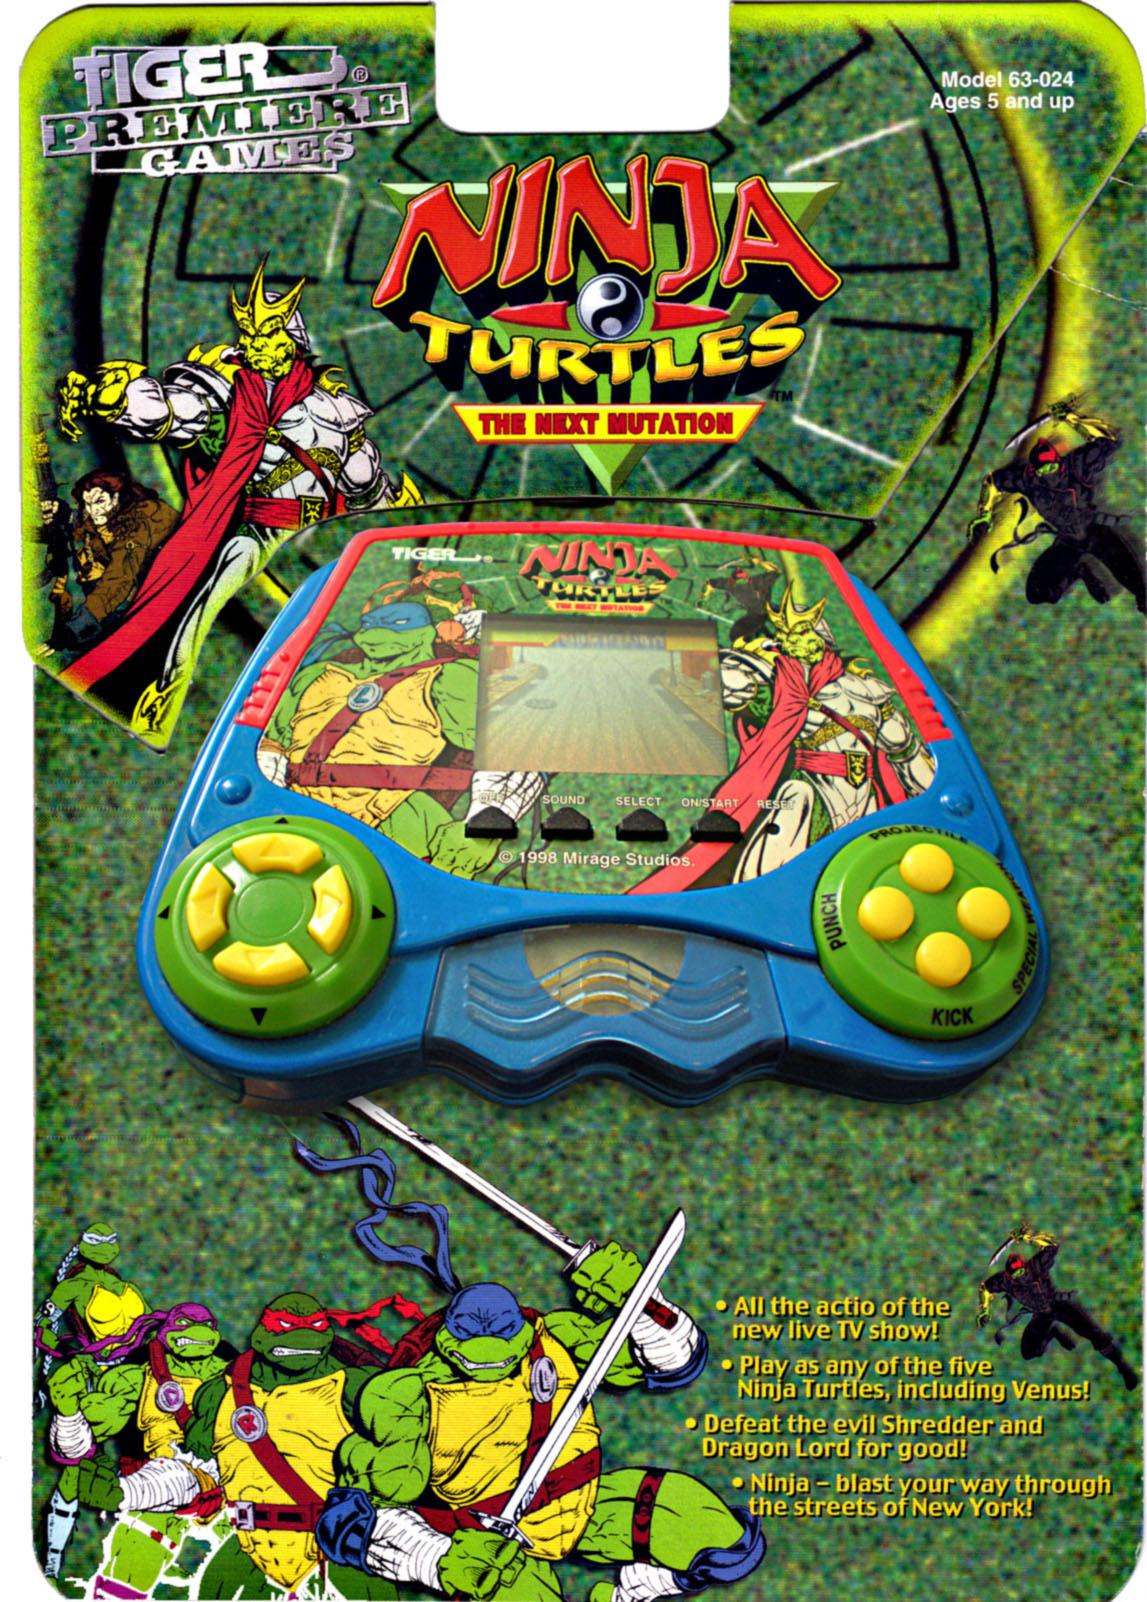 Ninja Turtles: The Next Mutation (LCD game)